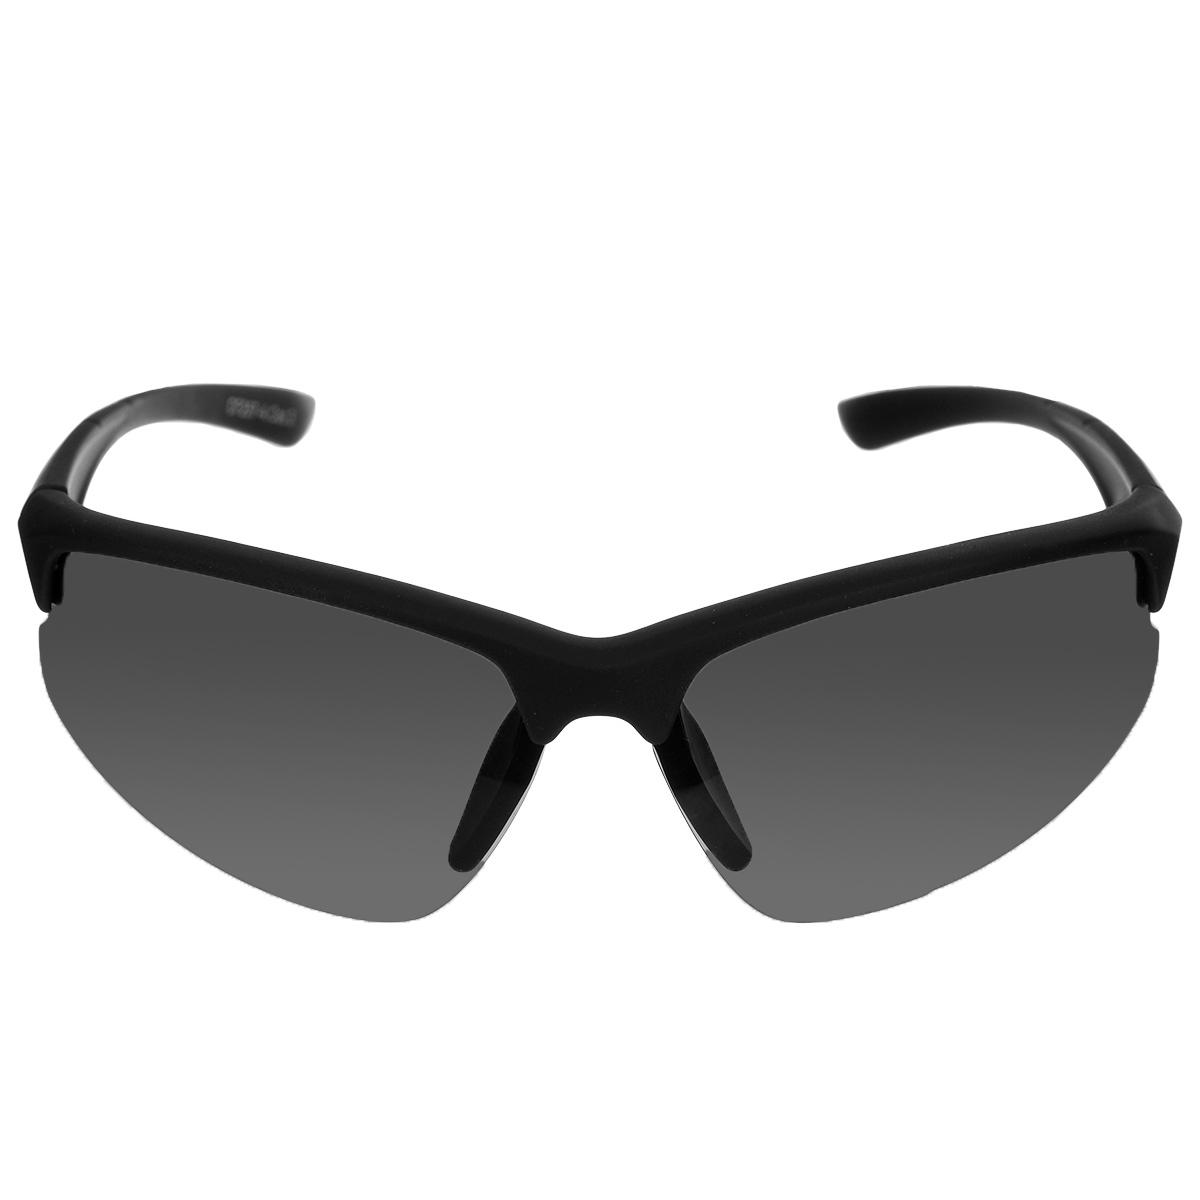 0e345132d700 Очки поляризационные Cafa France, цвет  серый. CF257 очки поляризационные  спортивные cafa france кафа